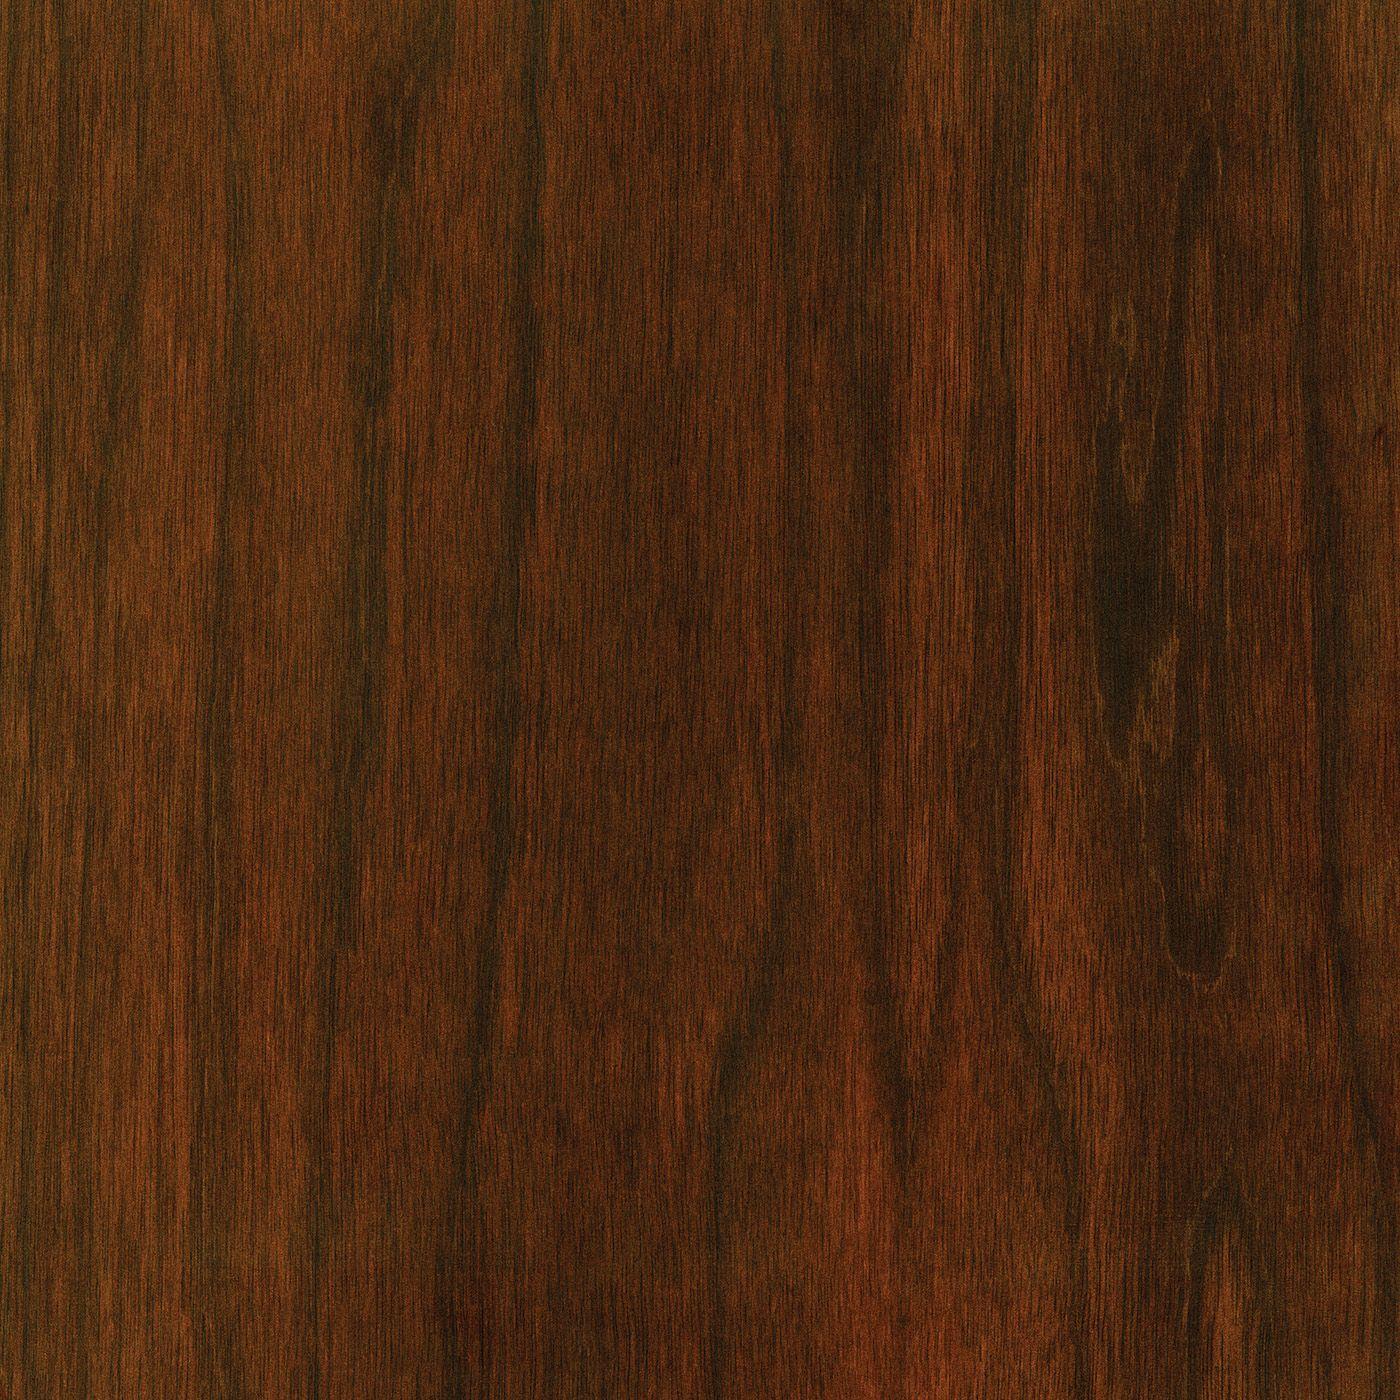 Walnut Wood Grain Google Search Santa Monica Blk Tux